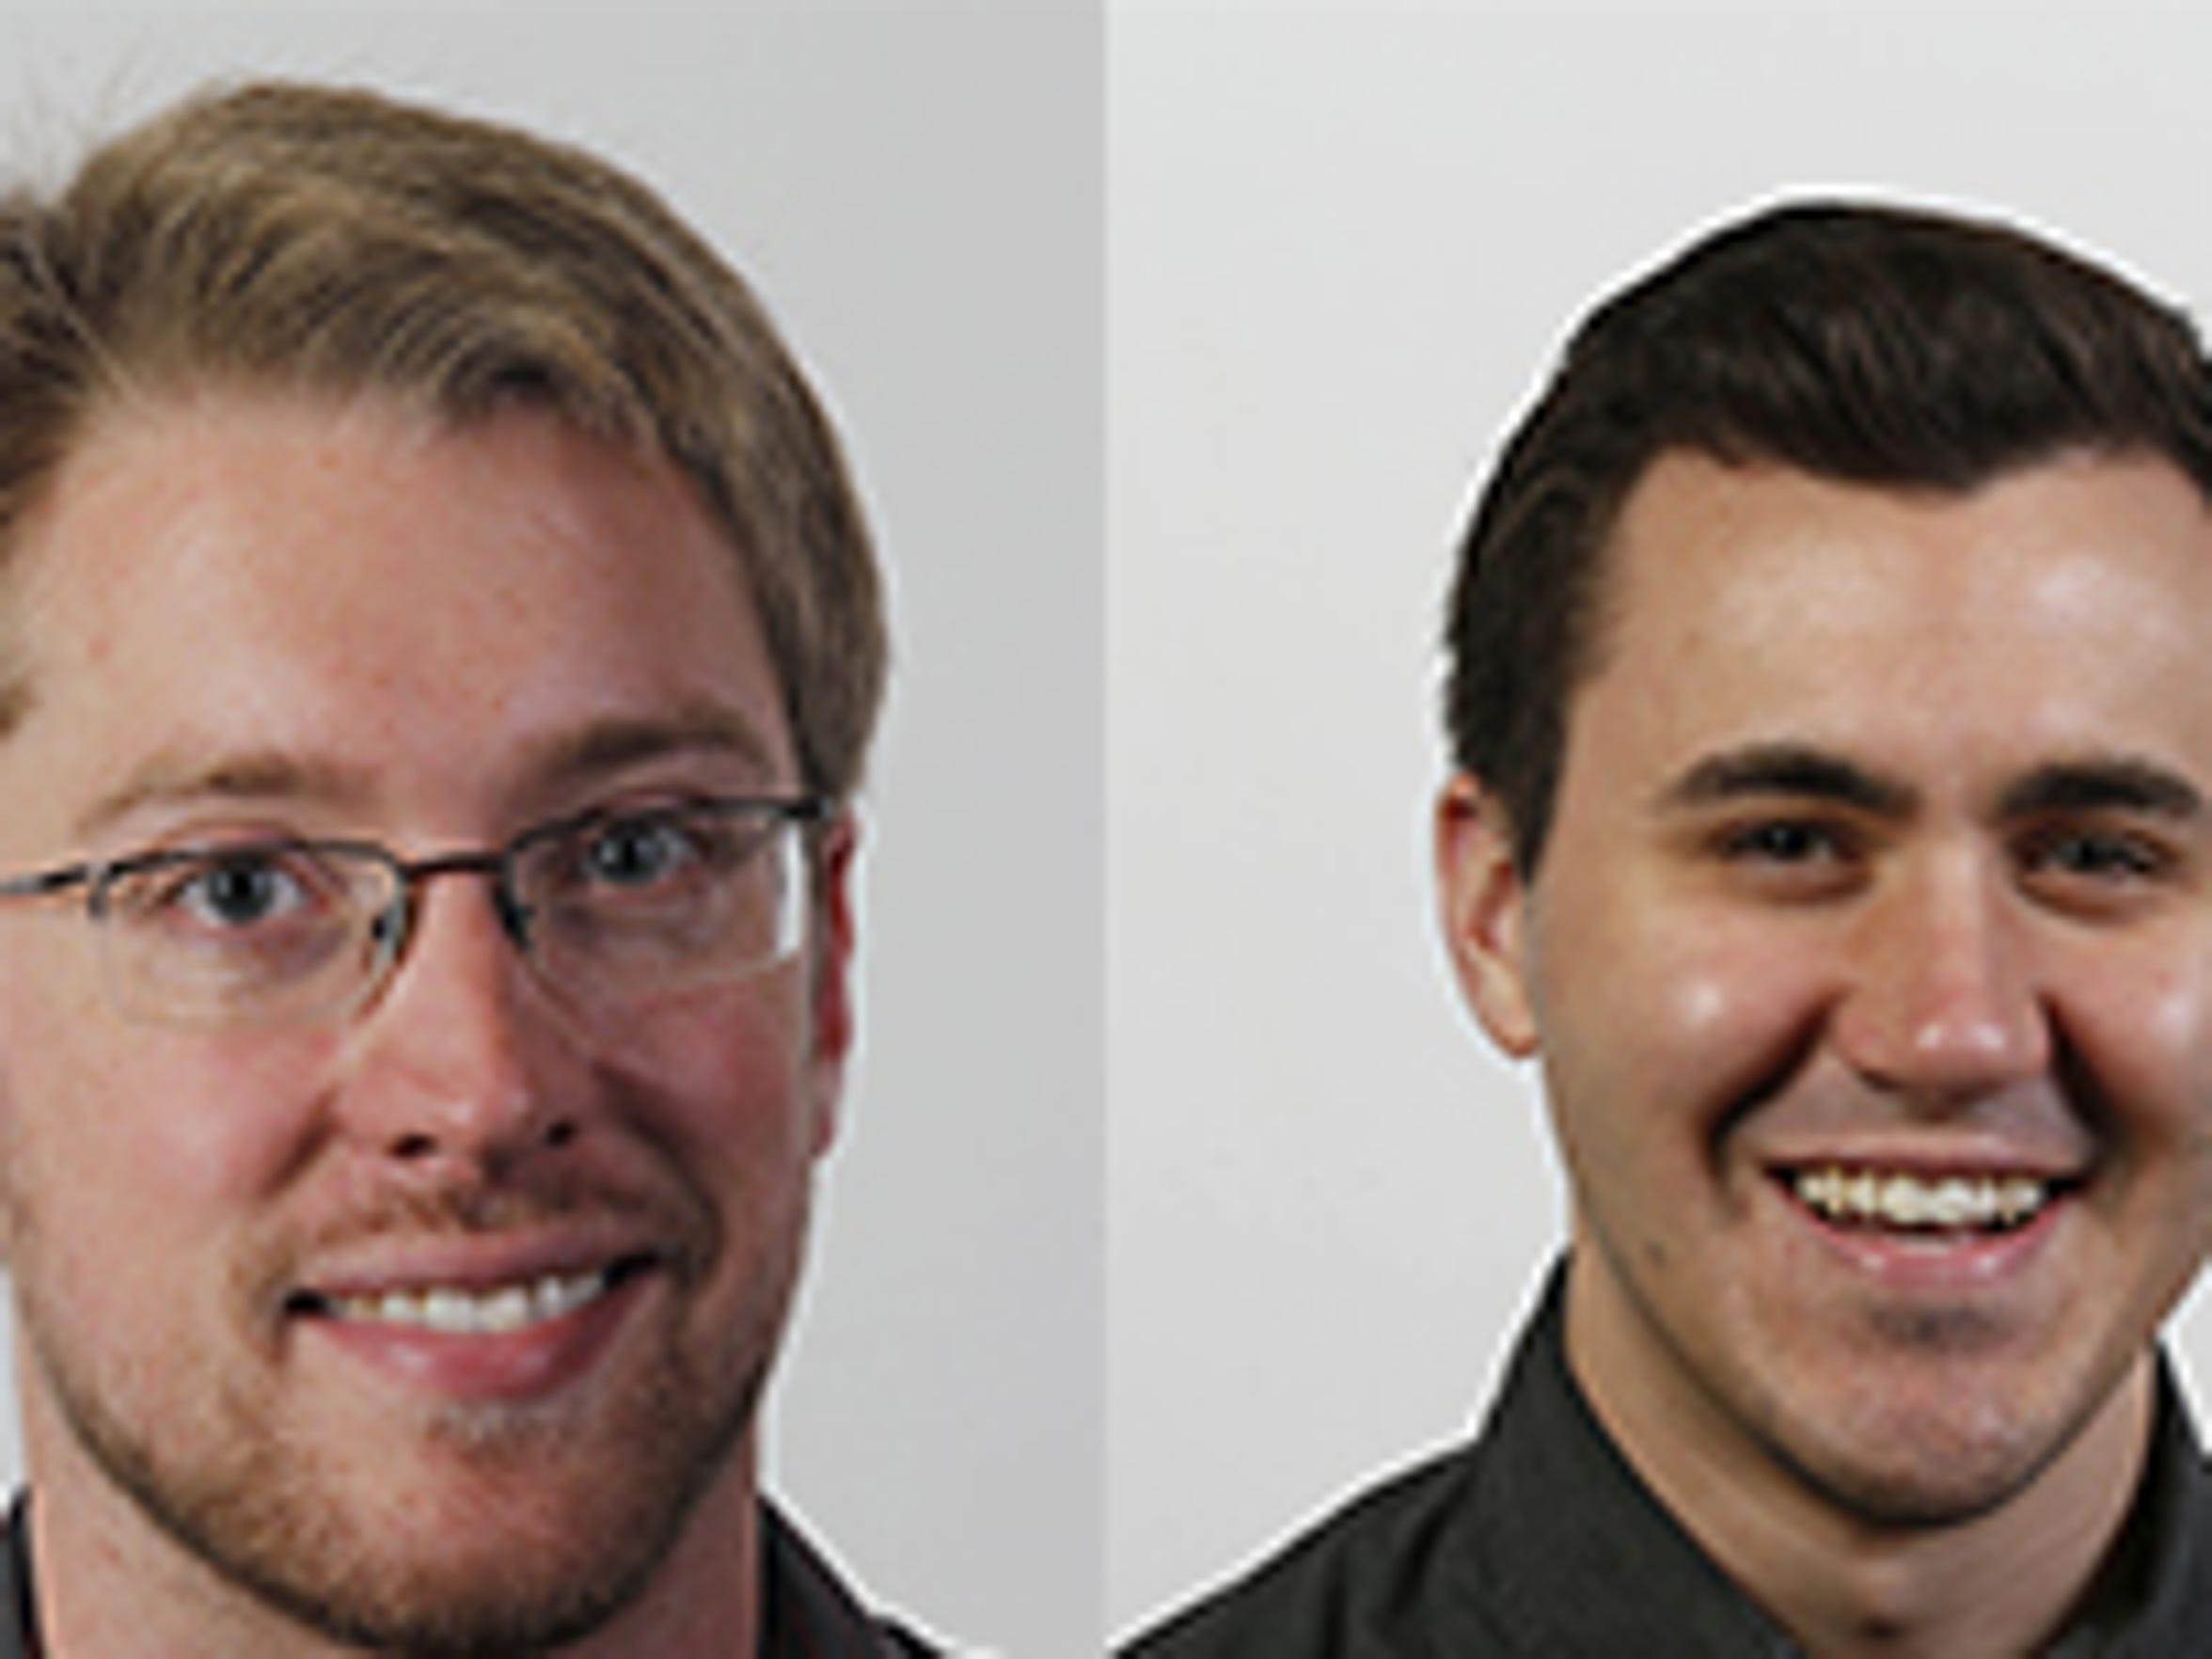 J&C Reporters Mikel Livingston and Steven Porter